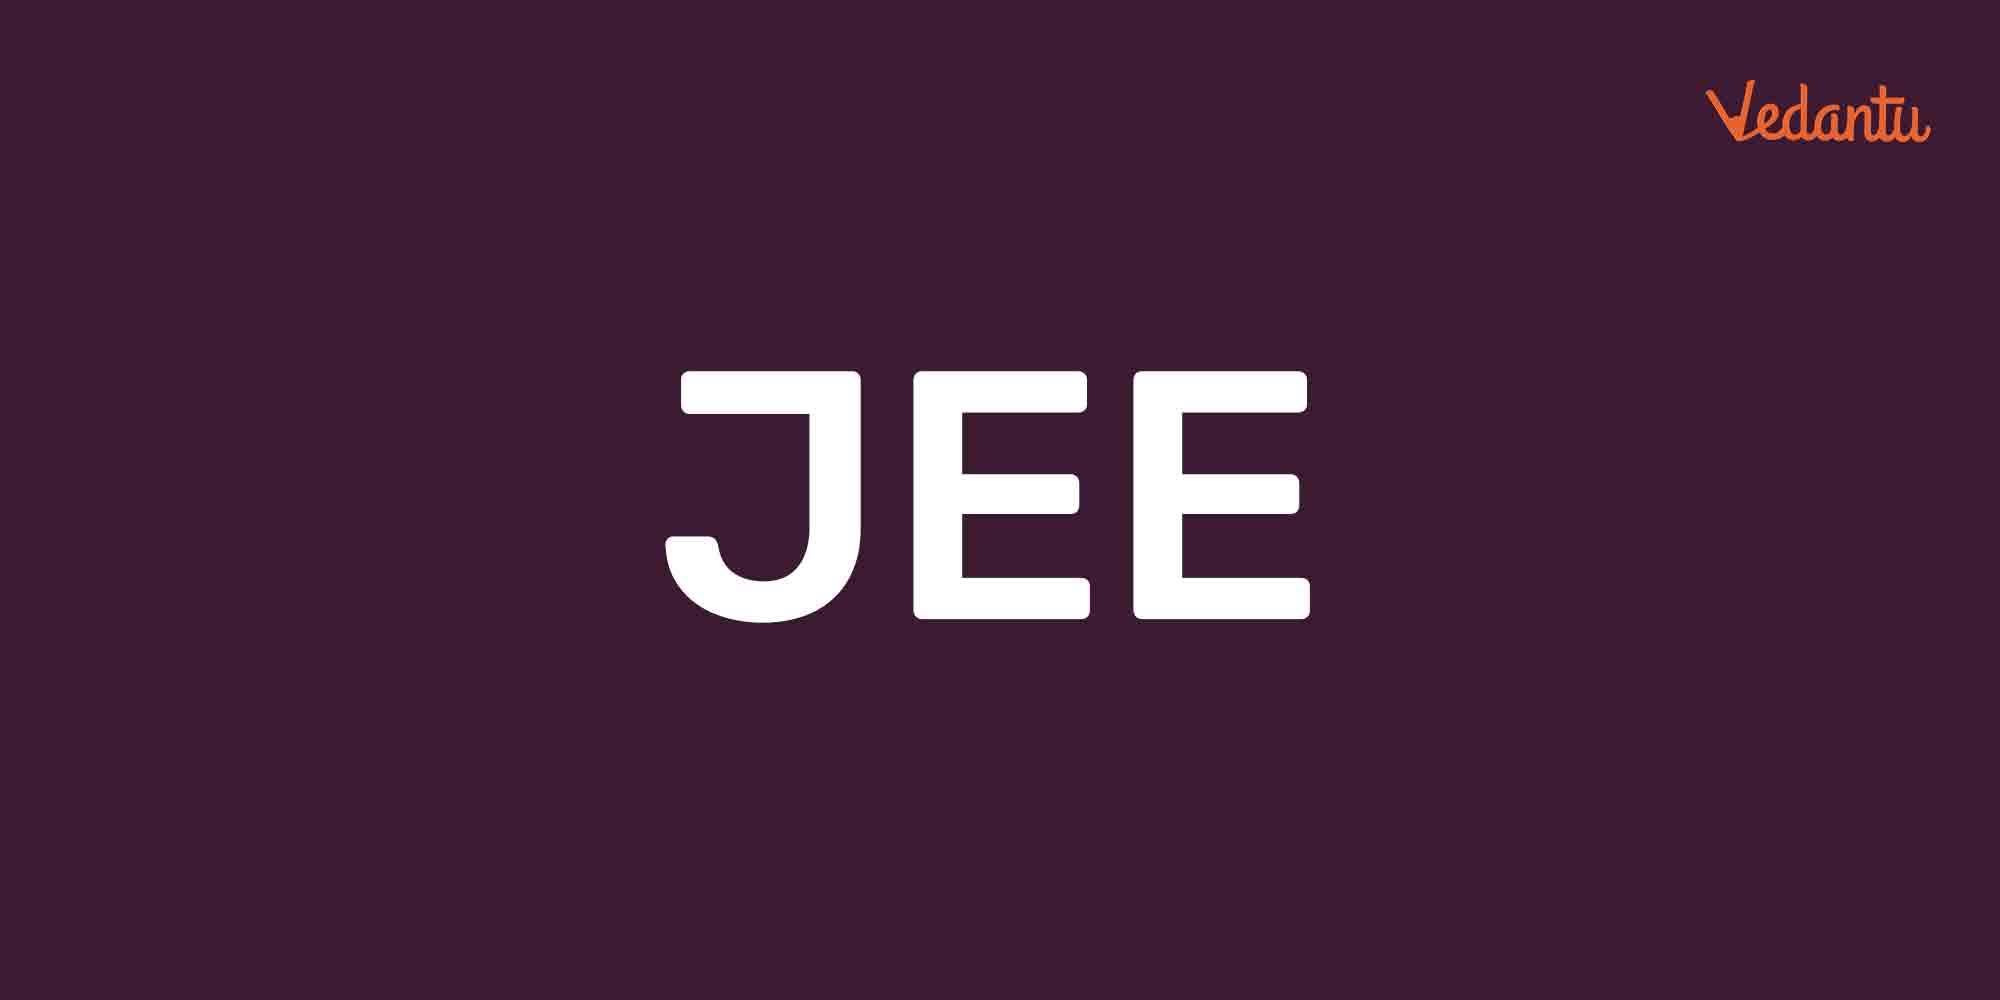 JEE Mains Online or Offline Exam Preferable?